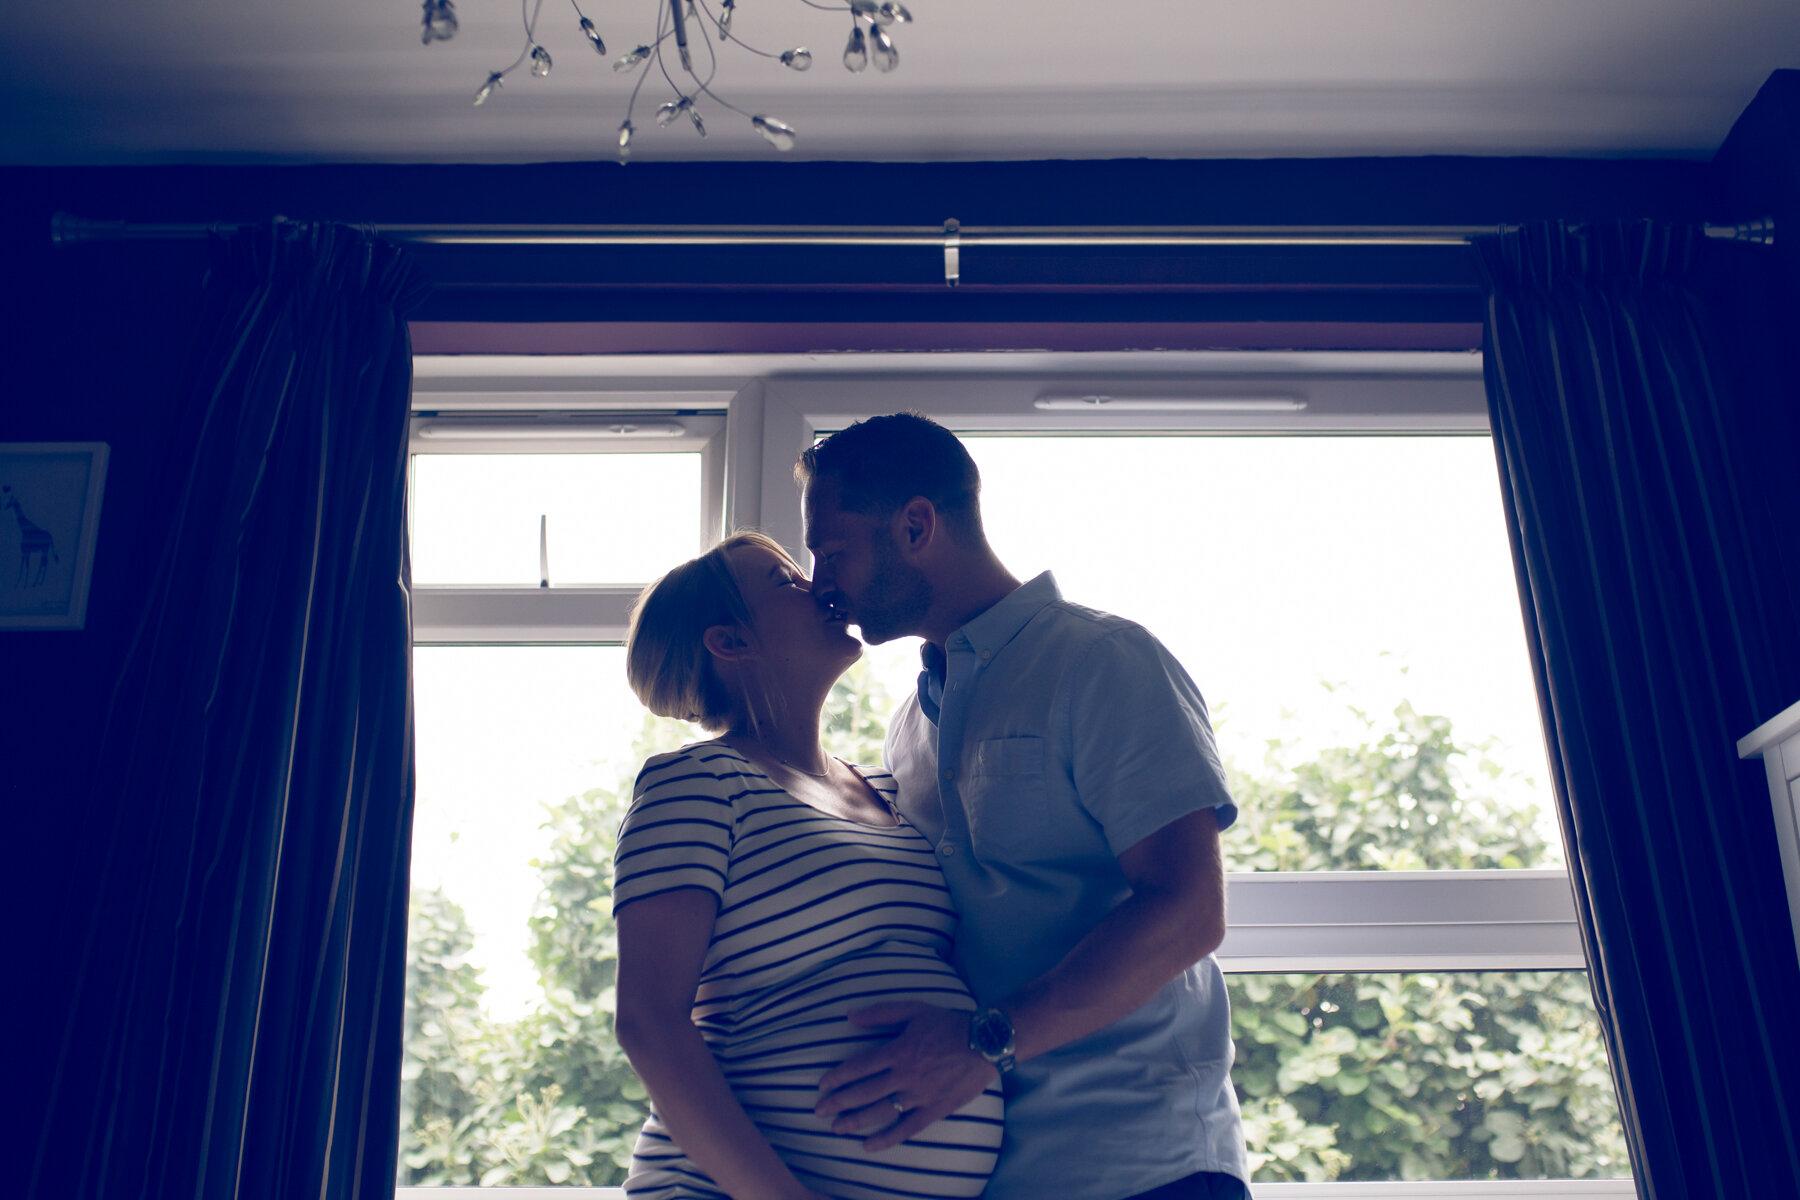 london_maternity.jpg